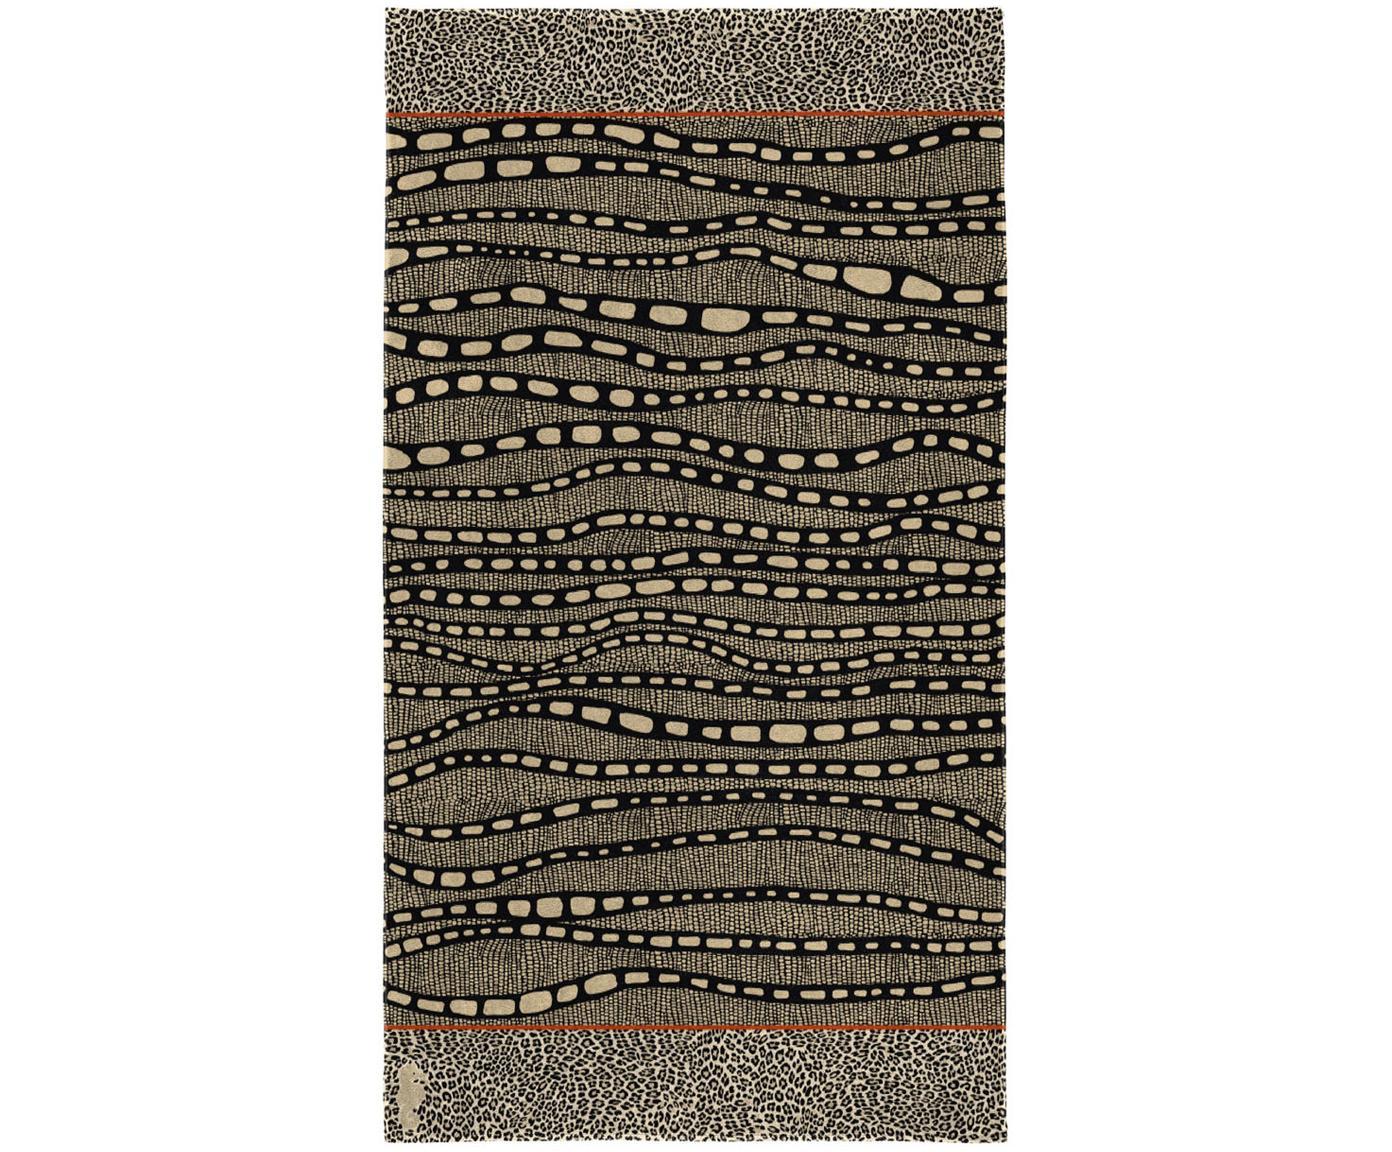 Strandlaken Idris, Fluweel (katoen) middelzware stofkwaliteit, 420g/m², Bruintinten, beigetinten, zwart, oranje, 100 x 180 cm